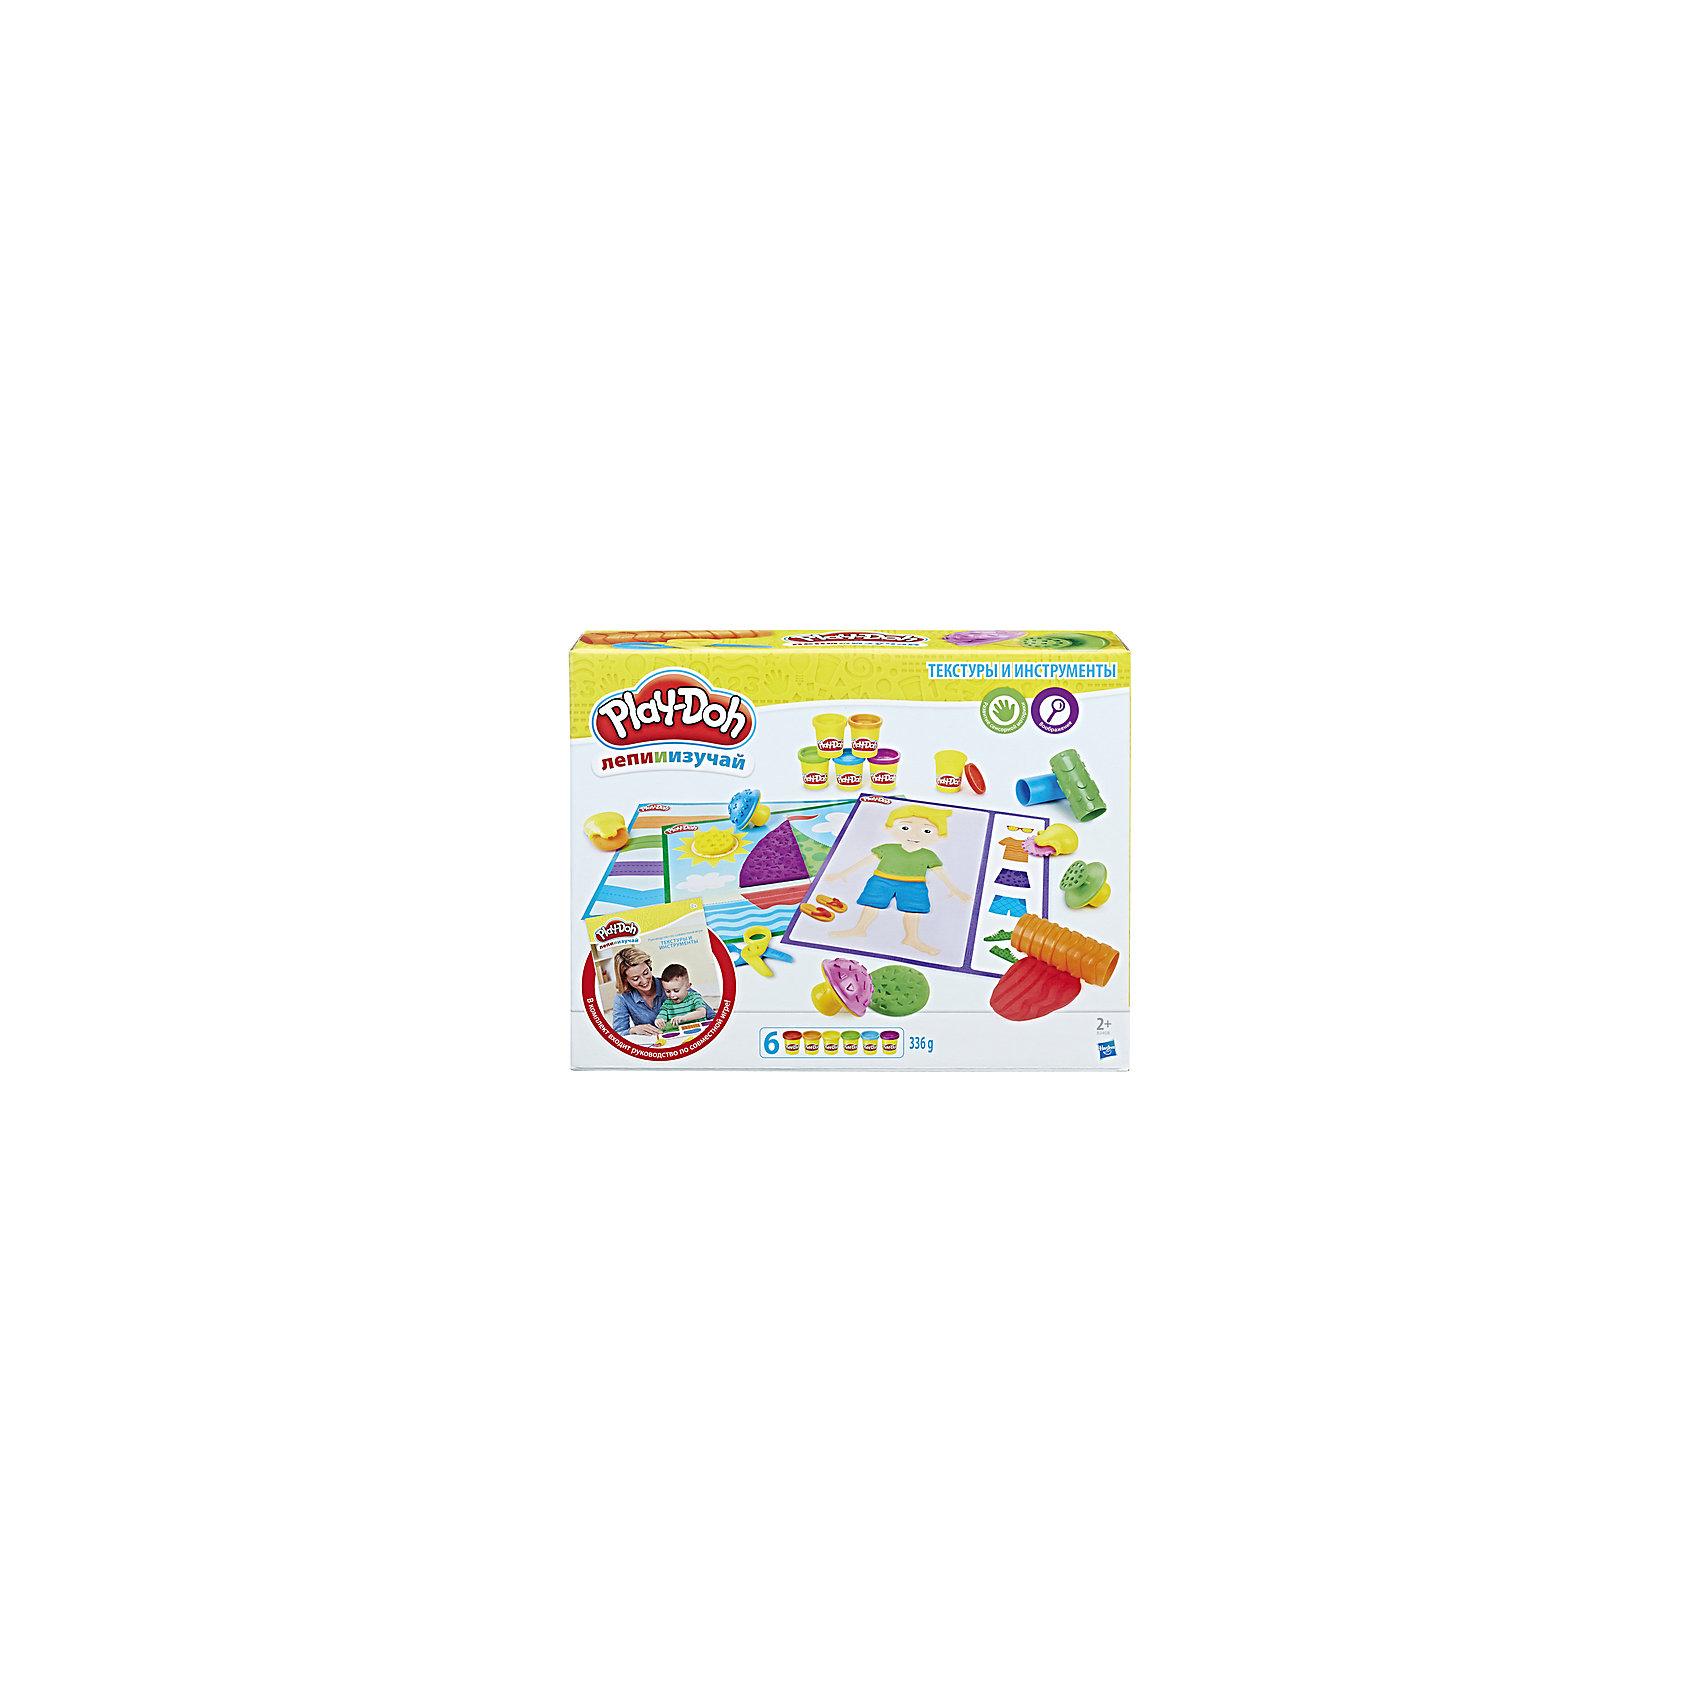 Акушерство. RuНабор пластилина Hasbro Play-Doh Текстуры и инструменты<br><br>Ширина мм: 68<br>Глубина мм: 279<br>Высота мм: 216<br>Вес г: 1134<br>Возраст от месяцев: 48<br>Возраст до месяцев: 2147483647<br>Пол: Мужской<br>Возраст: Детский<br>SKU: 7185996